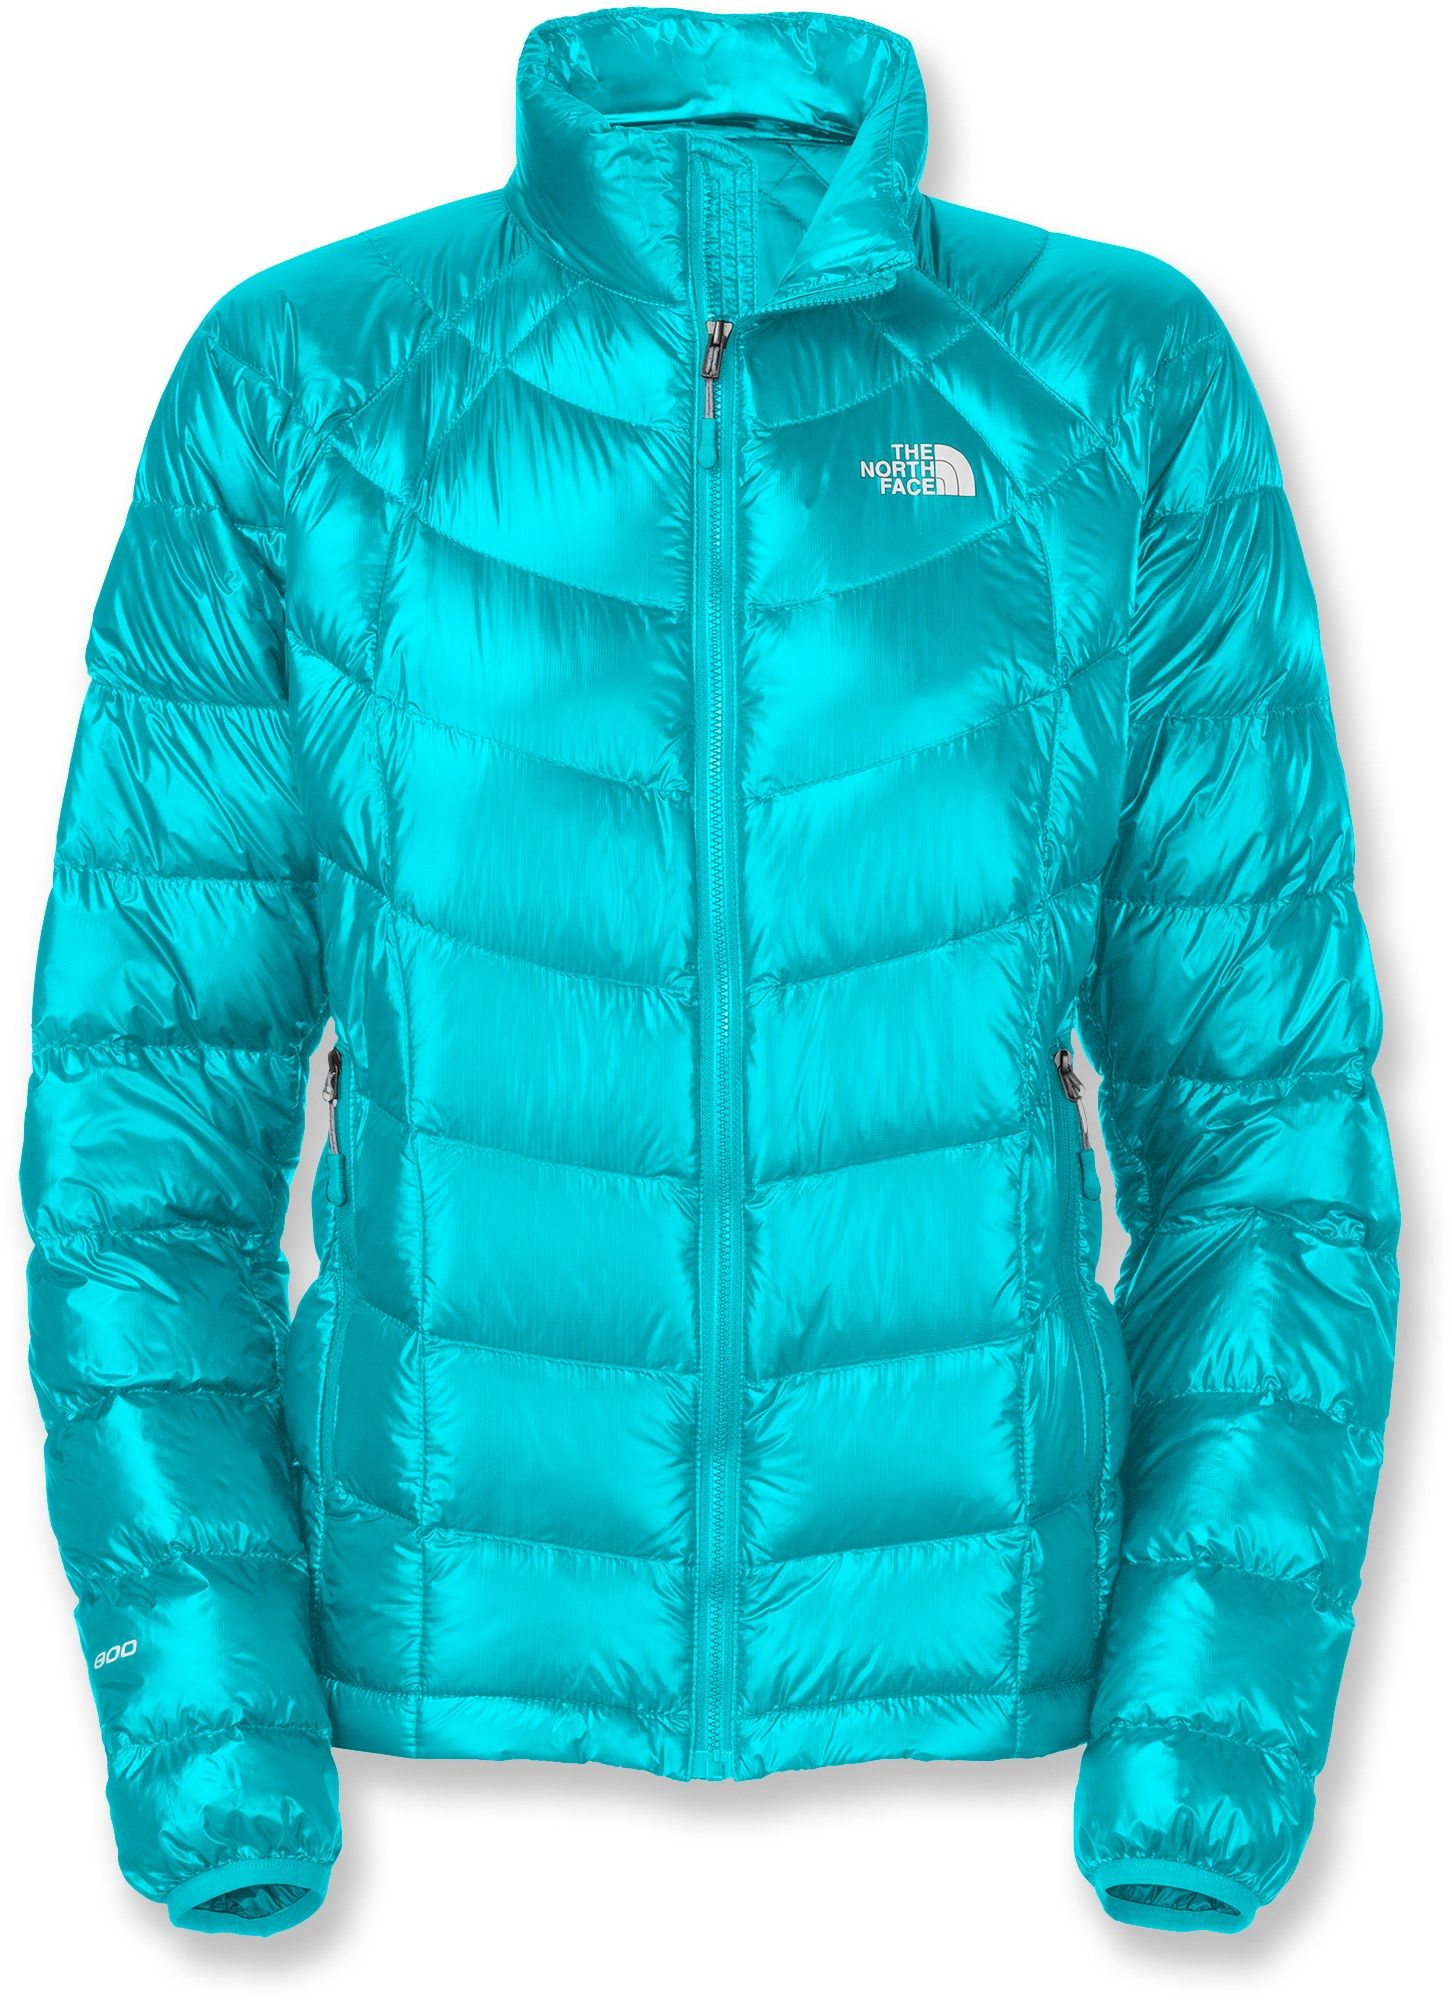 The North Face Super Diez Down Jacket Women S Rei Co Op Jackets For Women Down Jacket North Face Jacket Women S [ 2000 x 1452 Pixel ]